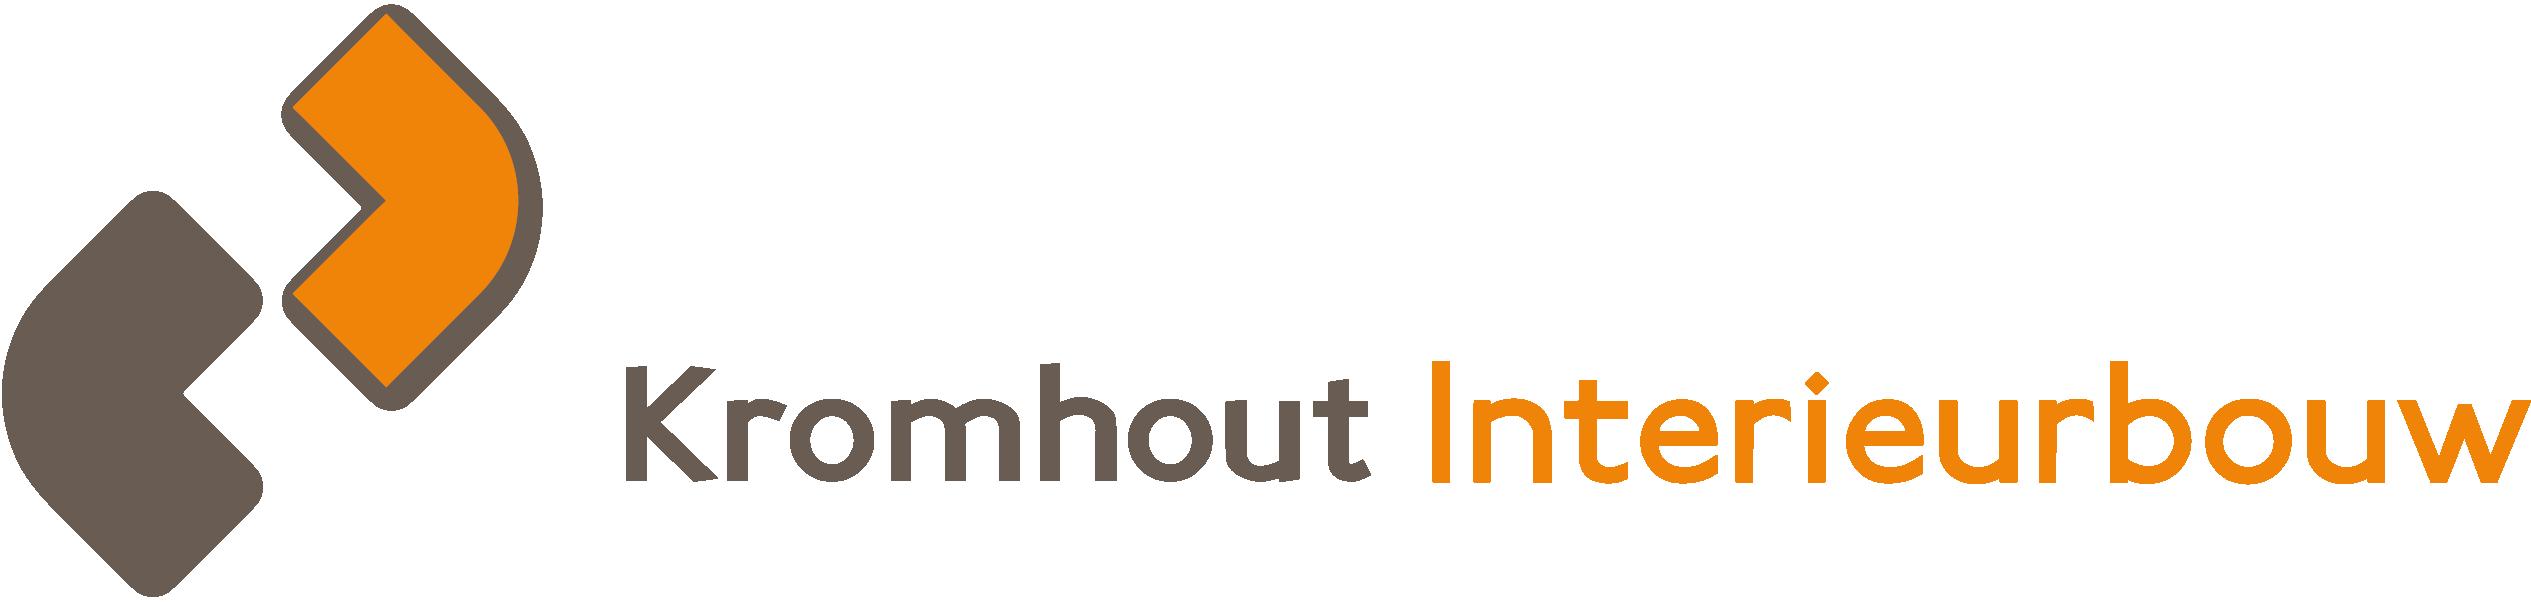 Kromhout-Interieurbouw-Logo